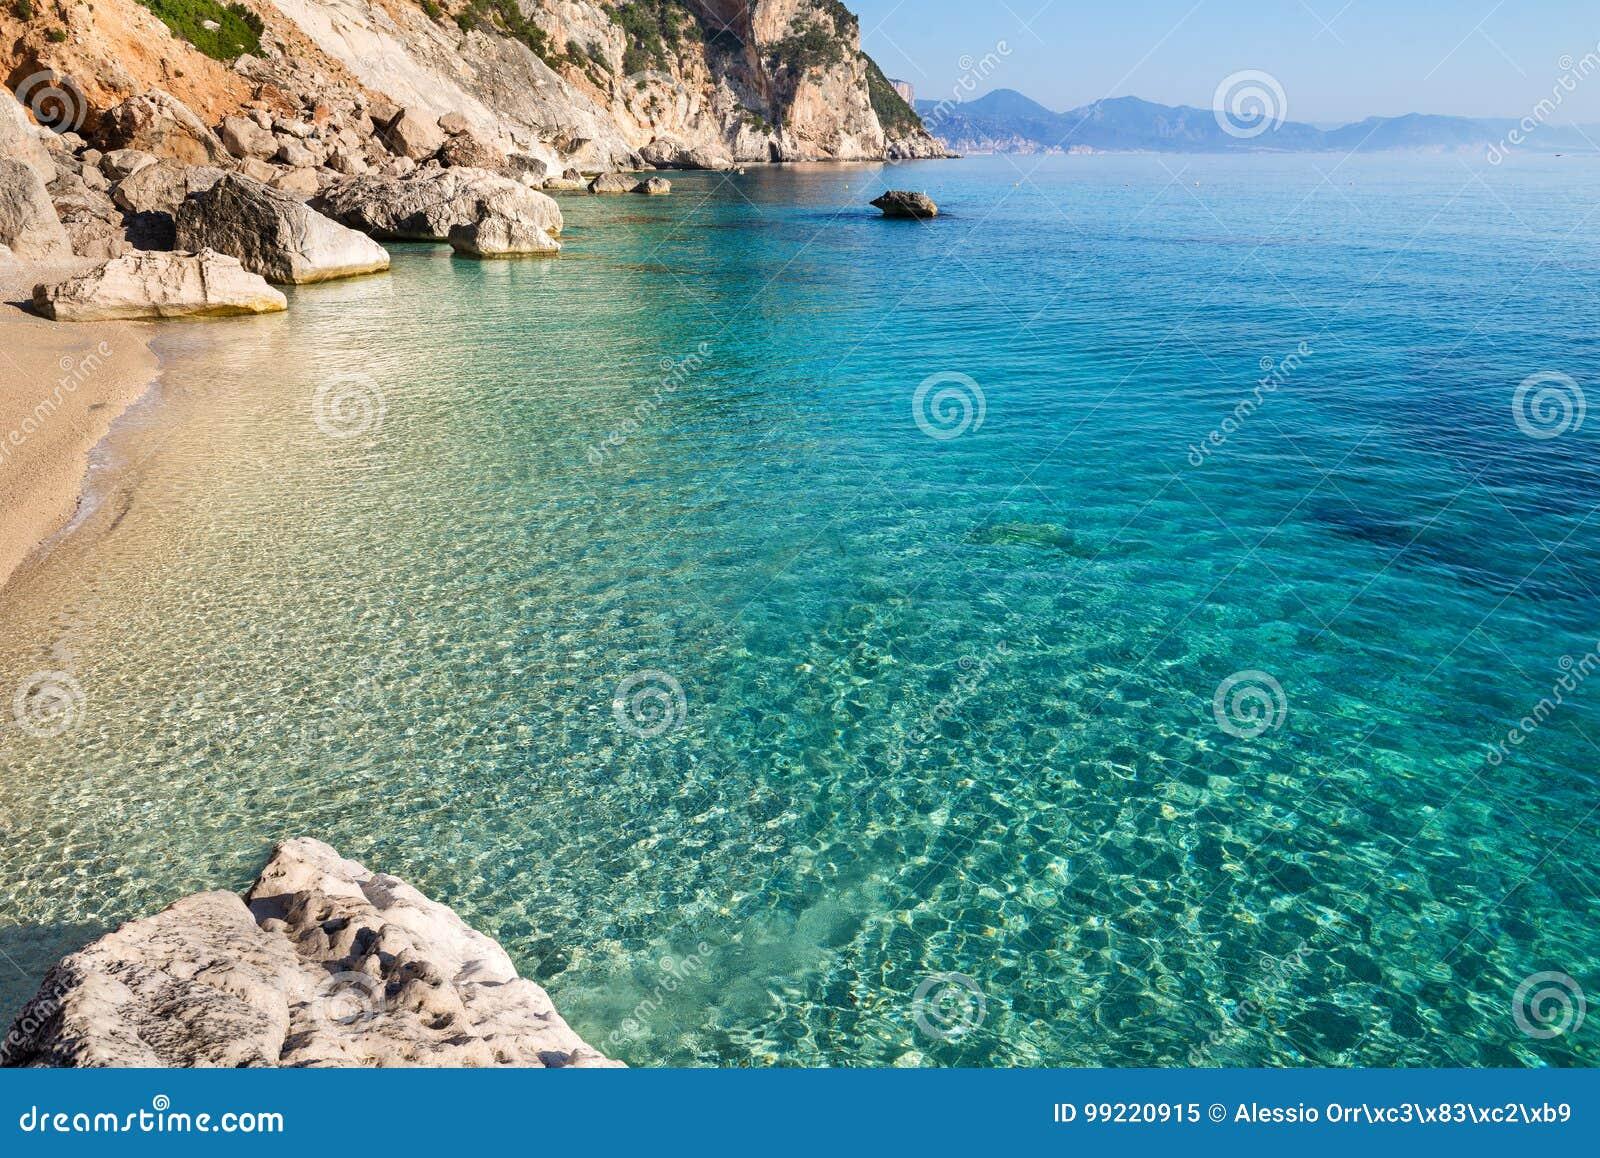 Cala Goloritze beach, Sardinia, Italy